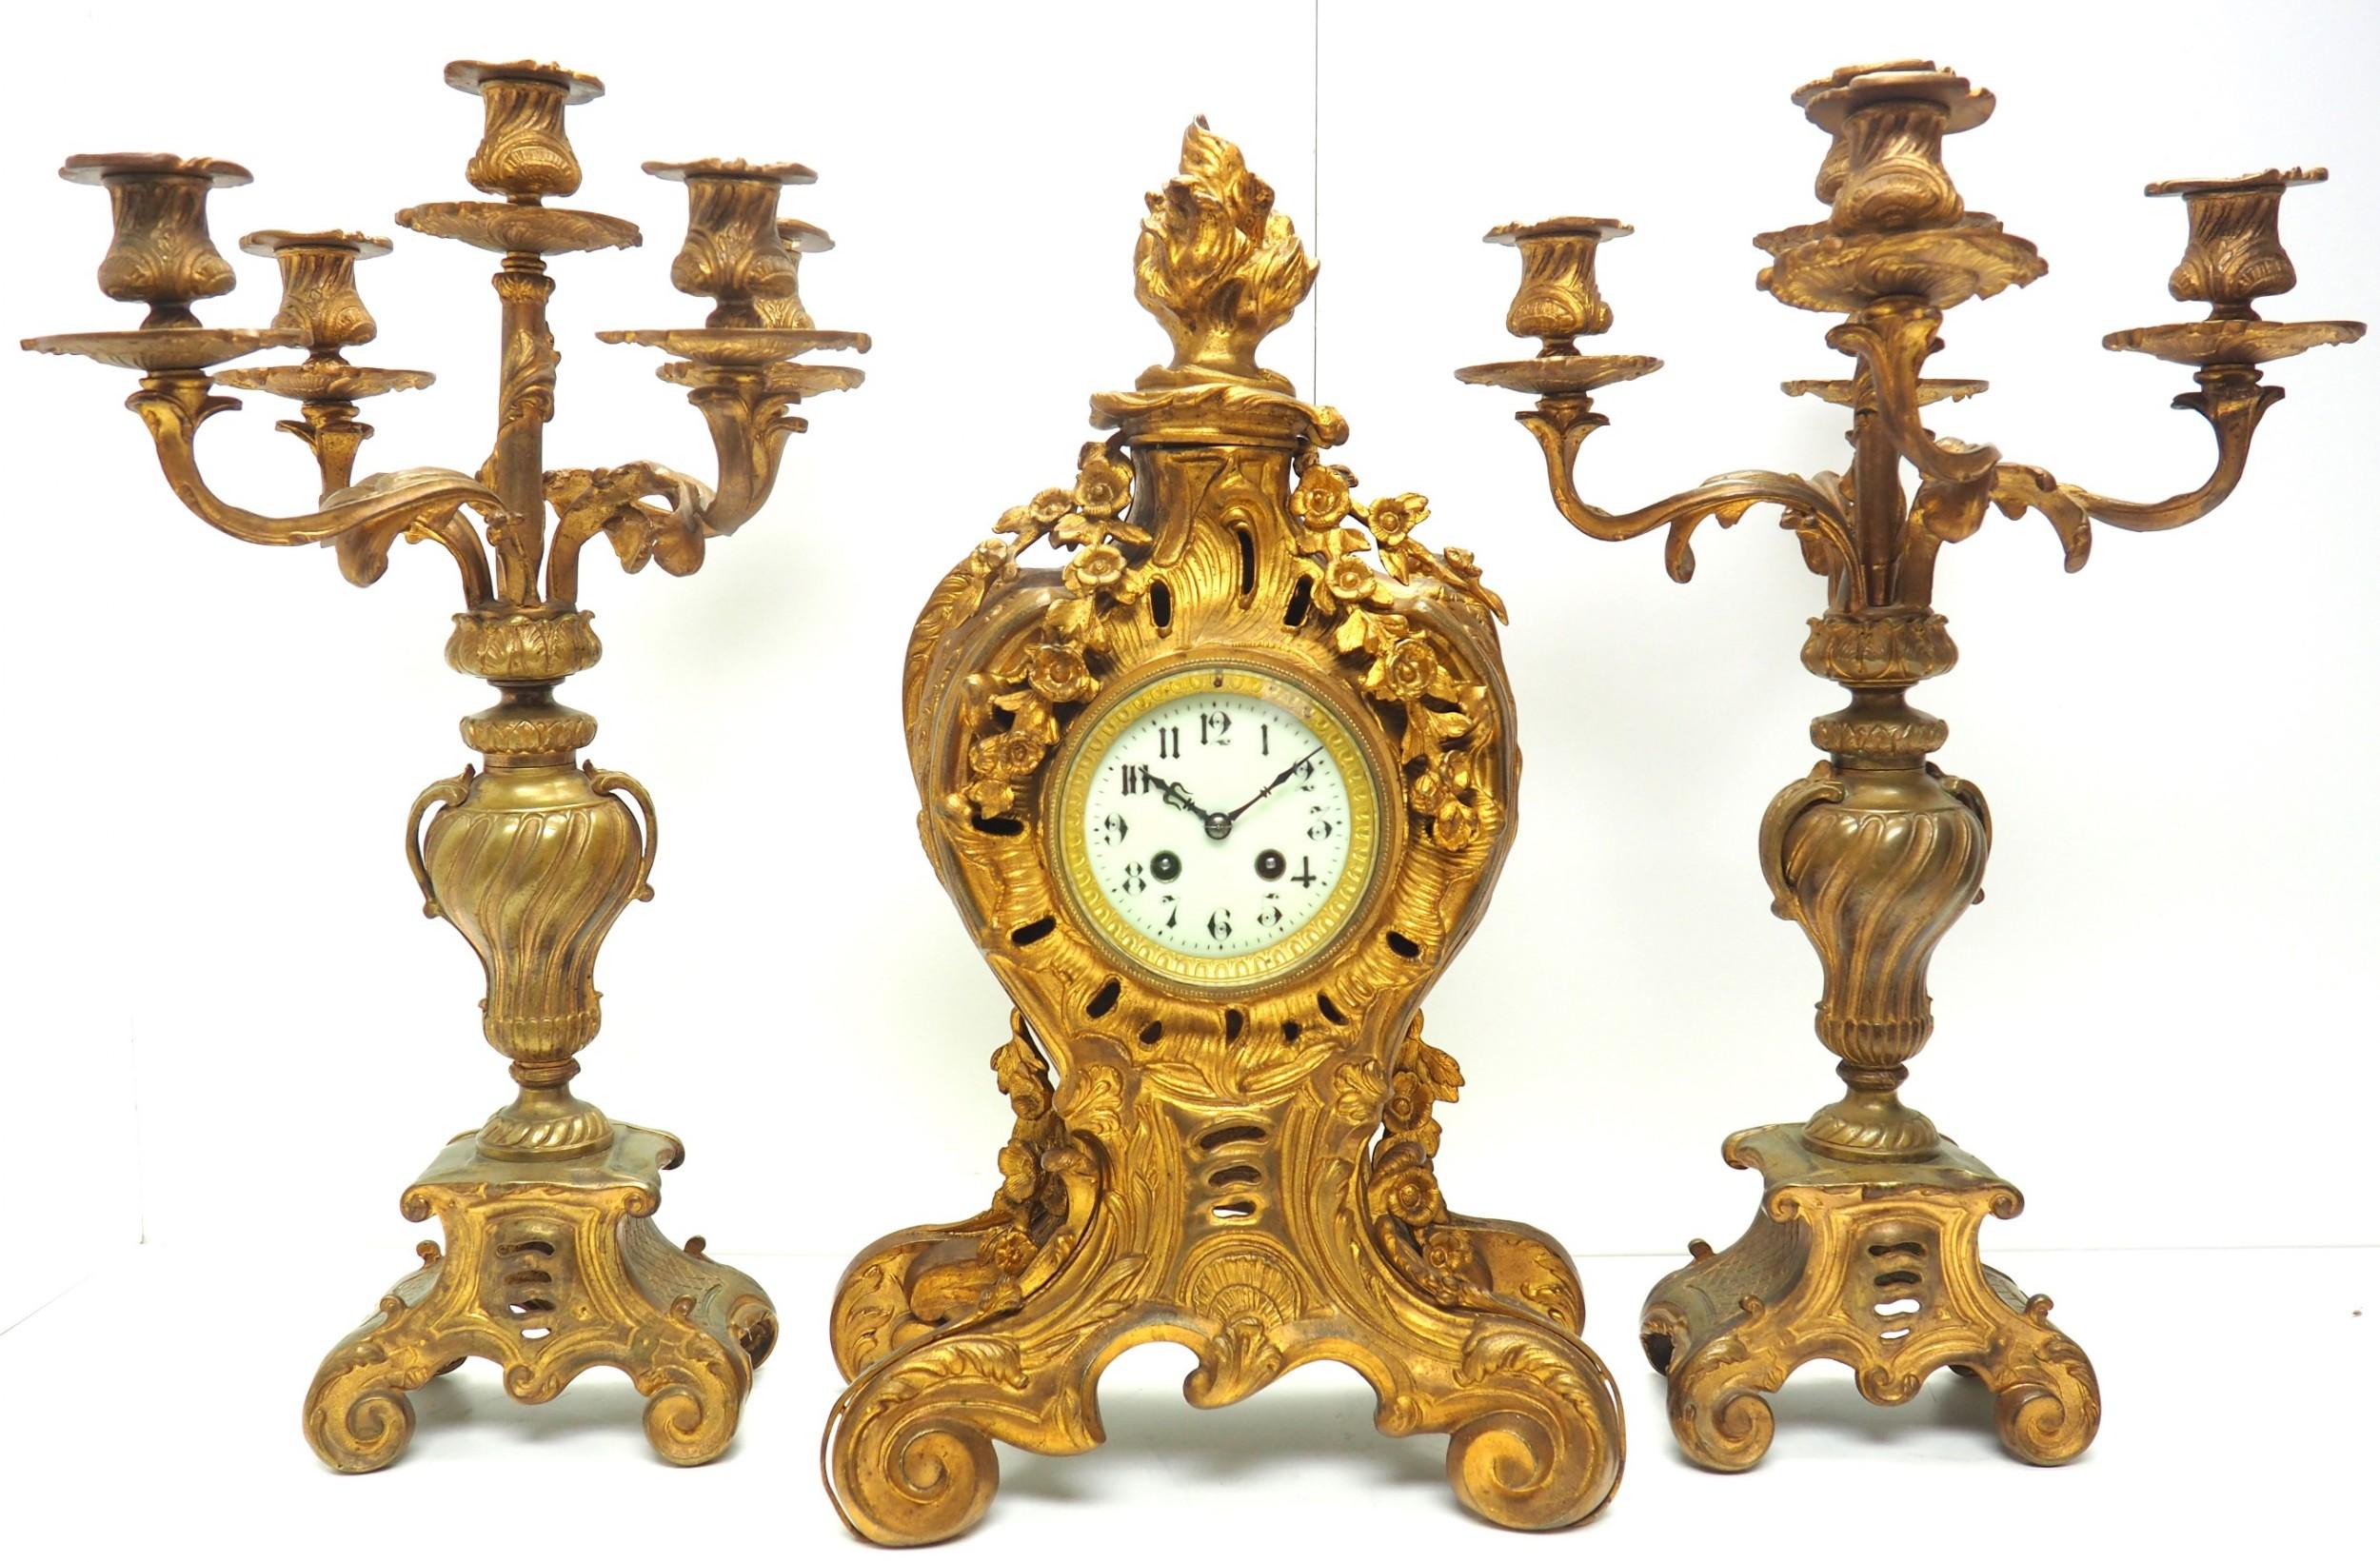 impressive candelabra clock set french rococo ormolu bronze mantel clock